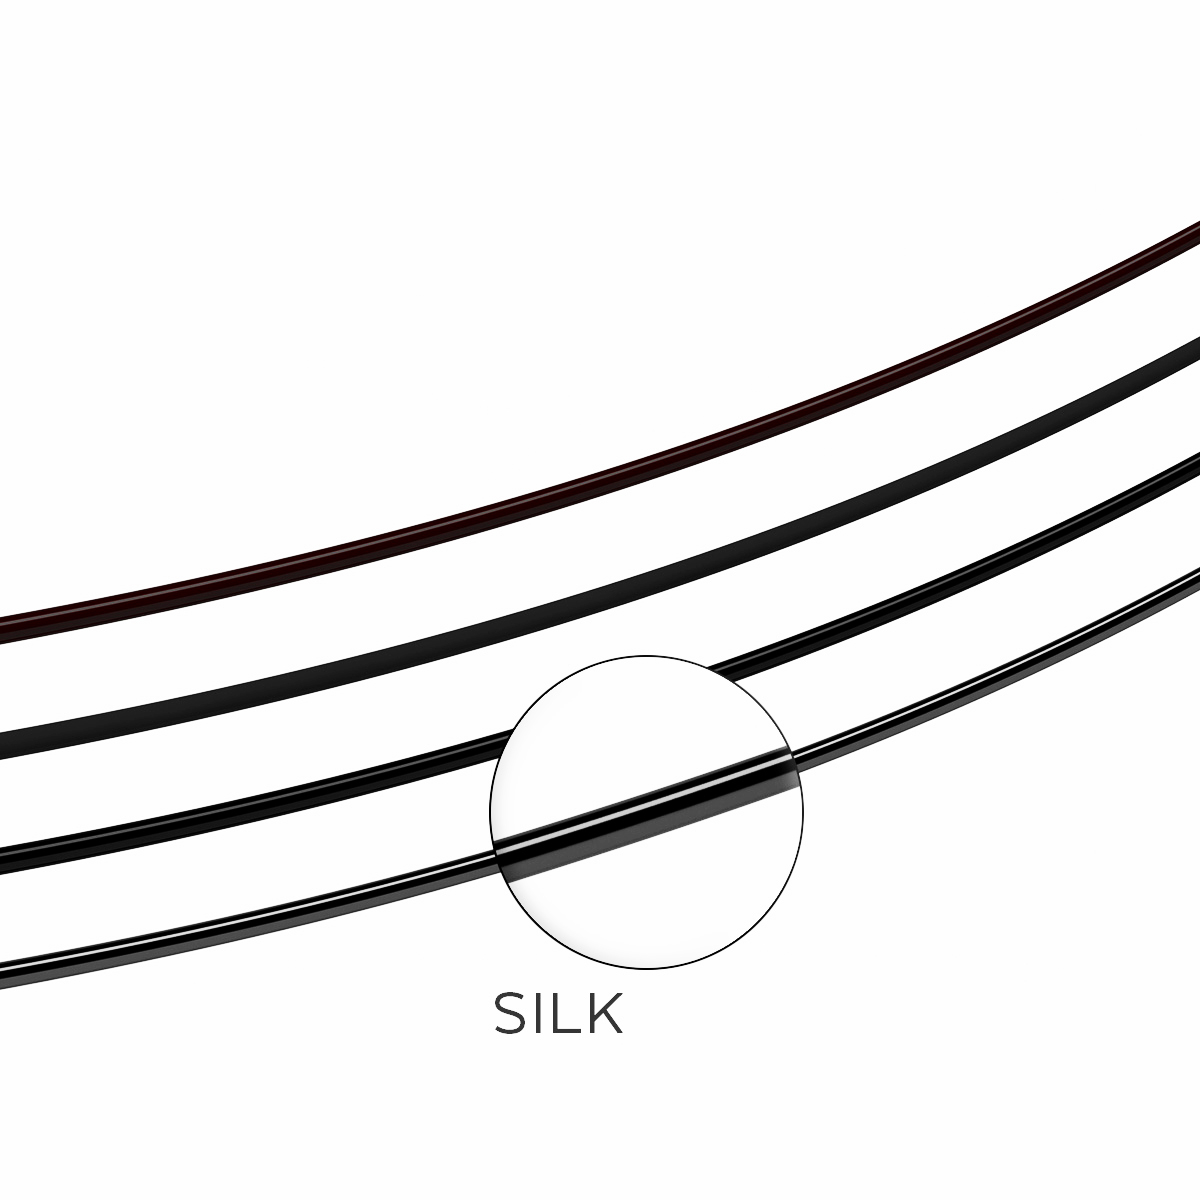 rzesy-objetosciowe-silk-black-l-0-1